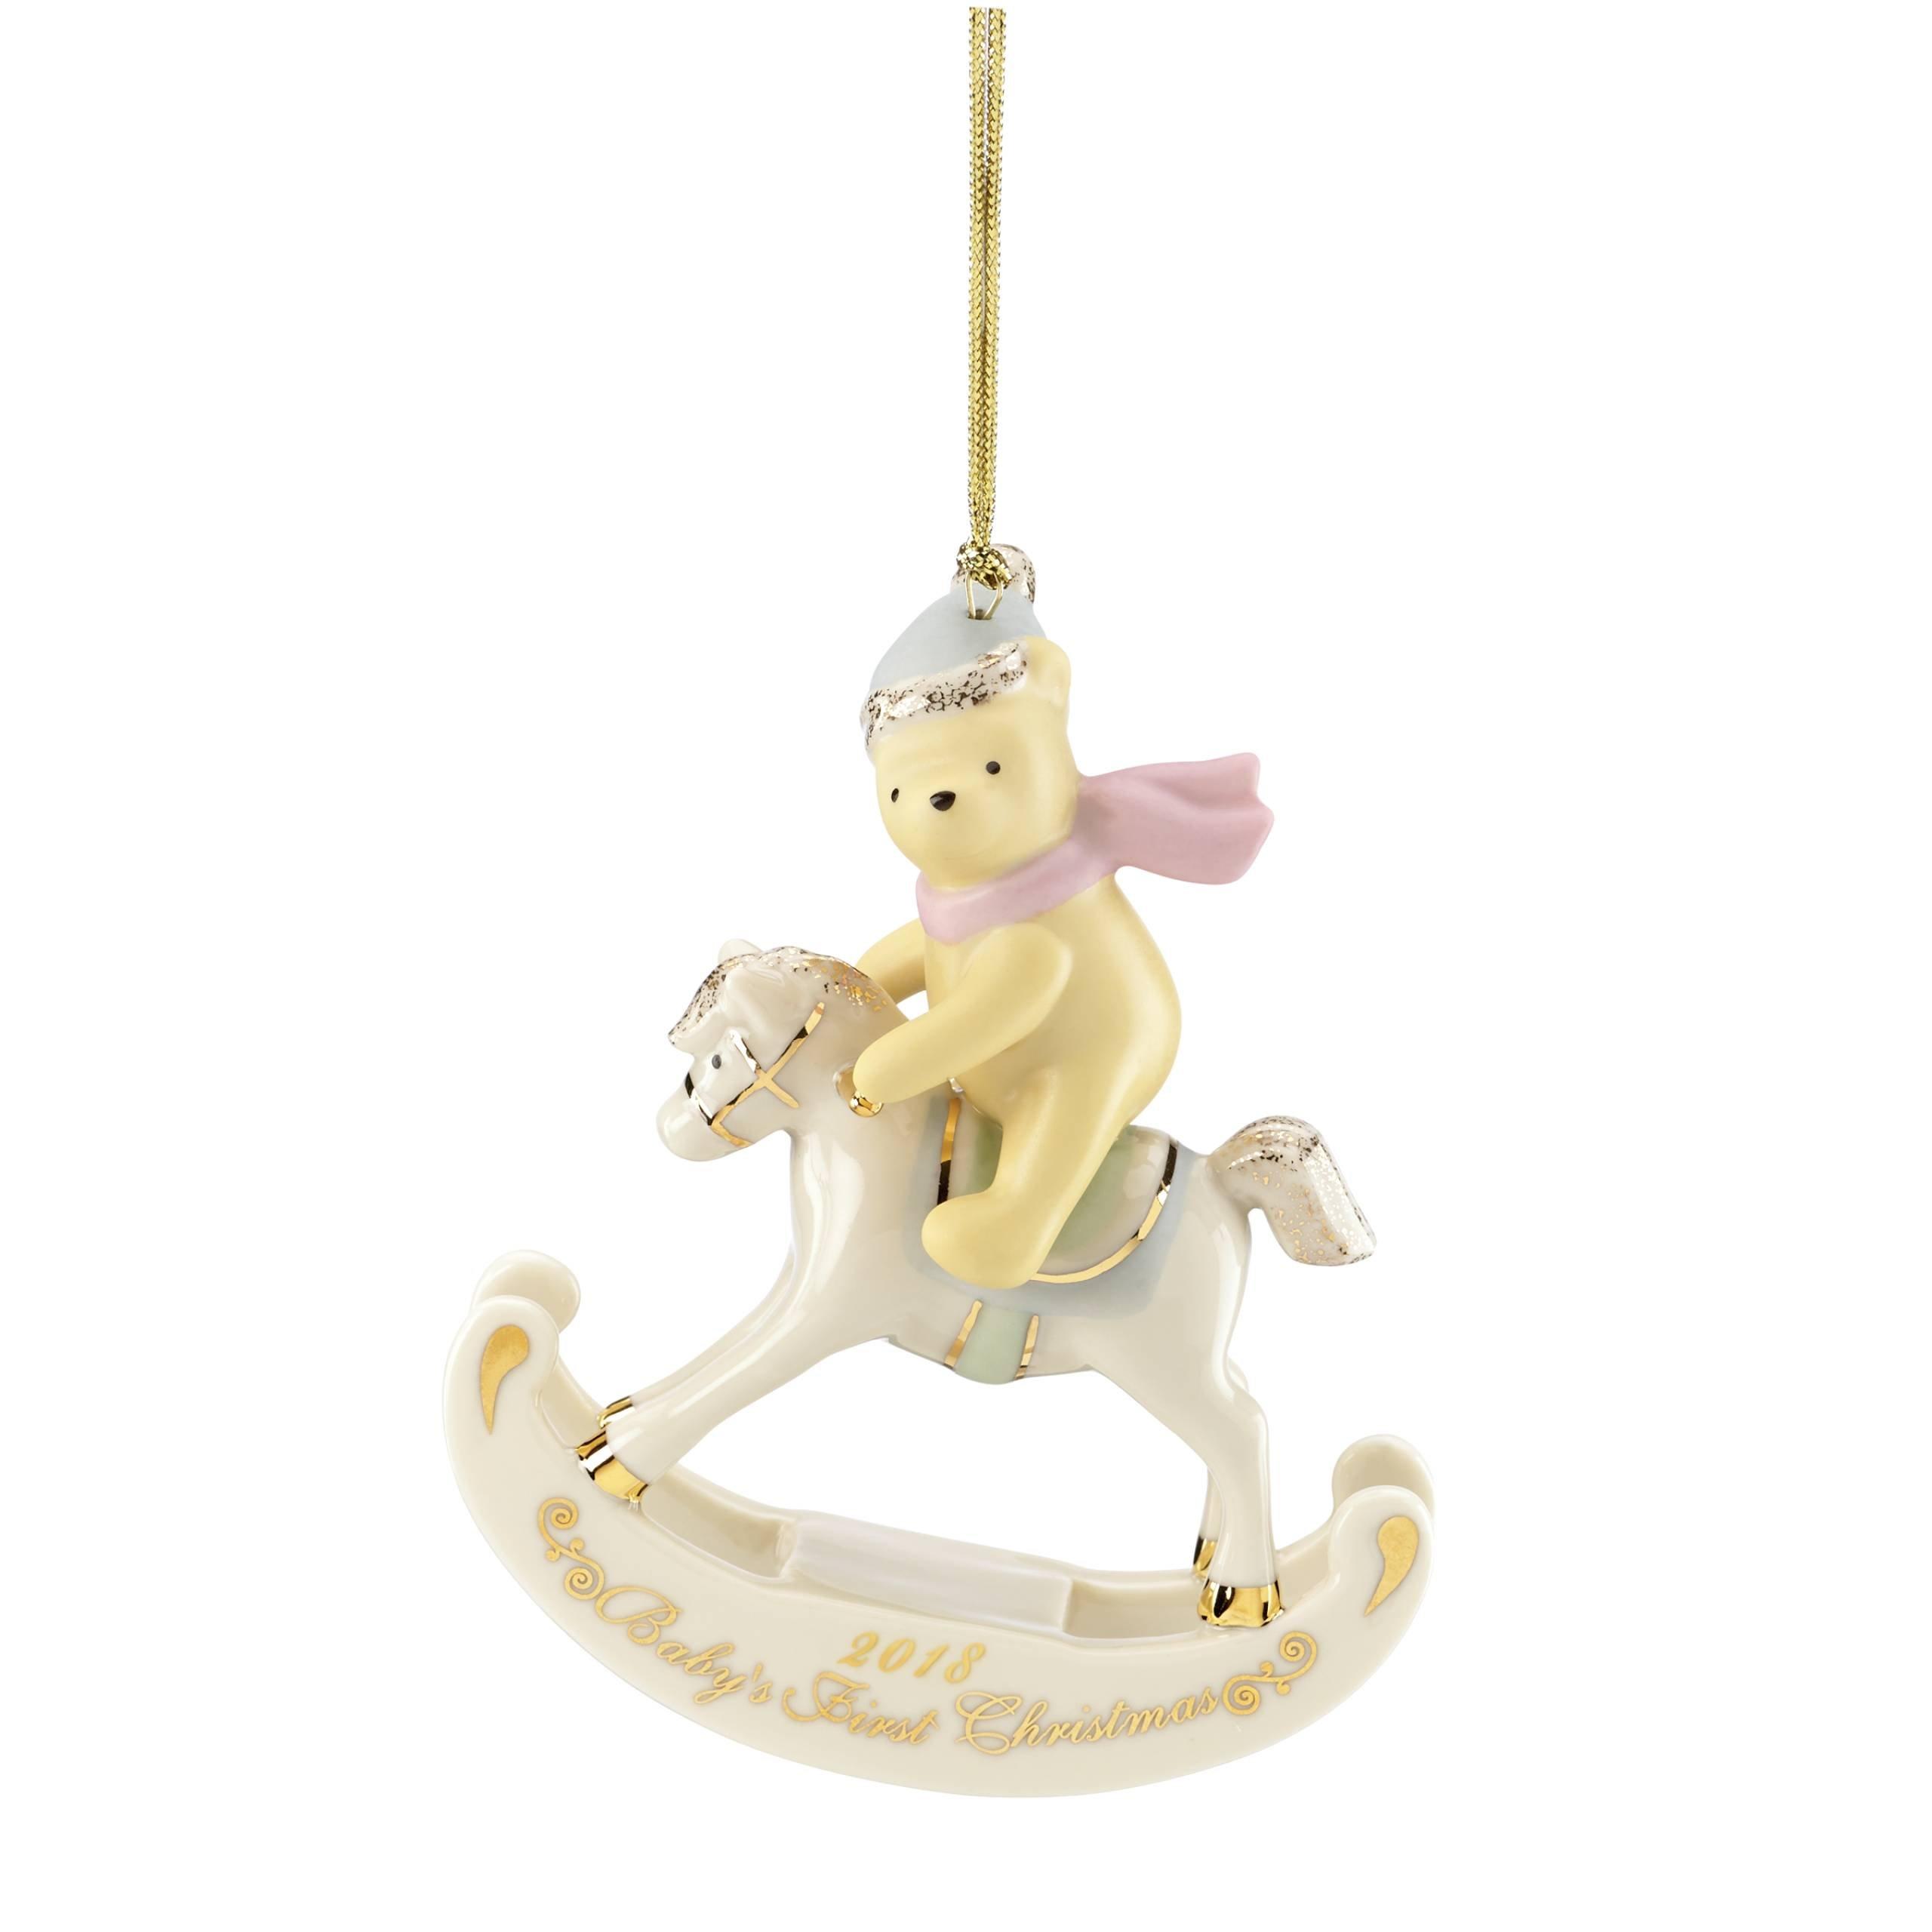 Lenox 2018 Winne the Pooh Baby's 1st Christmas Ornament